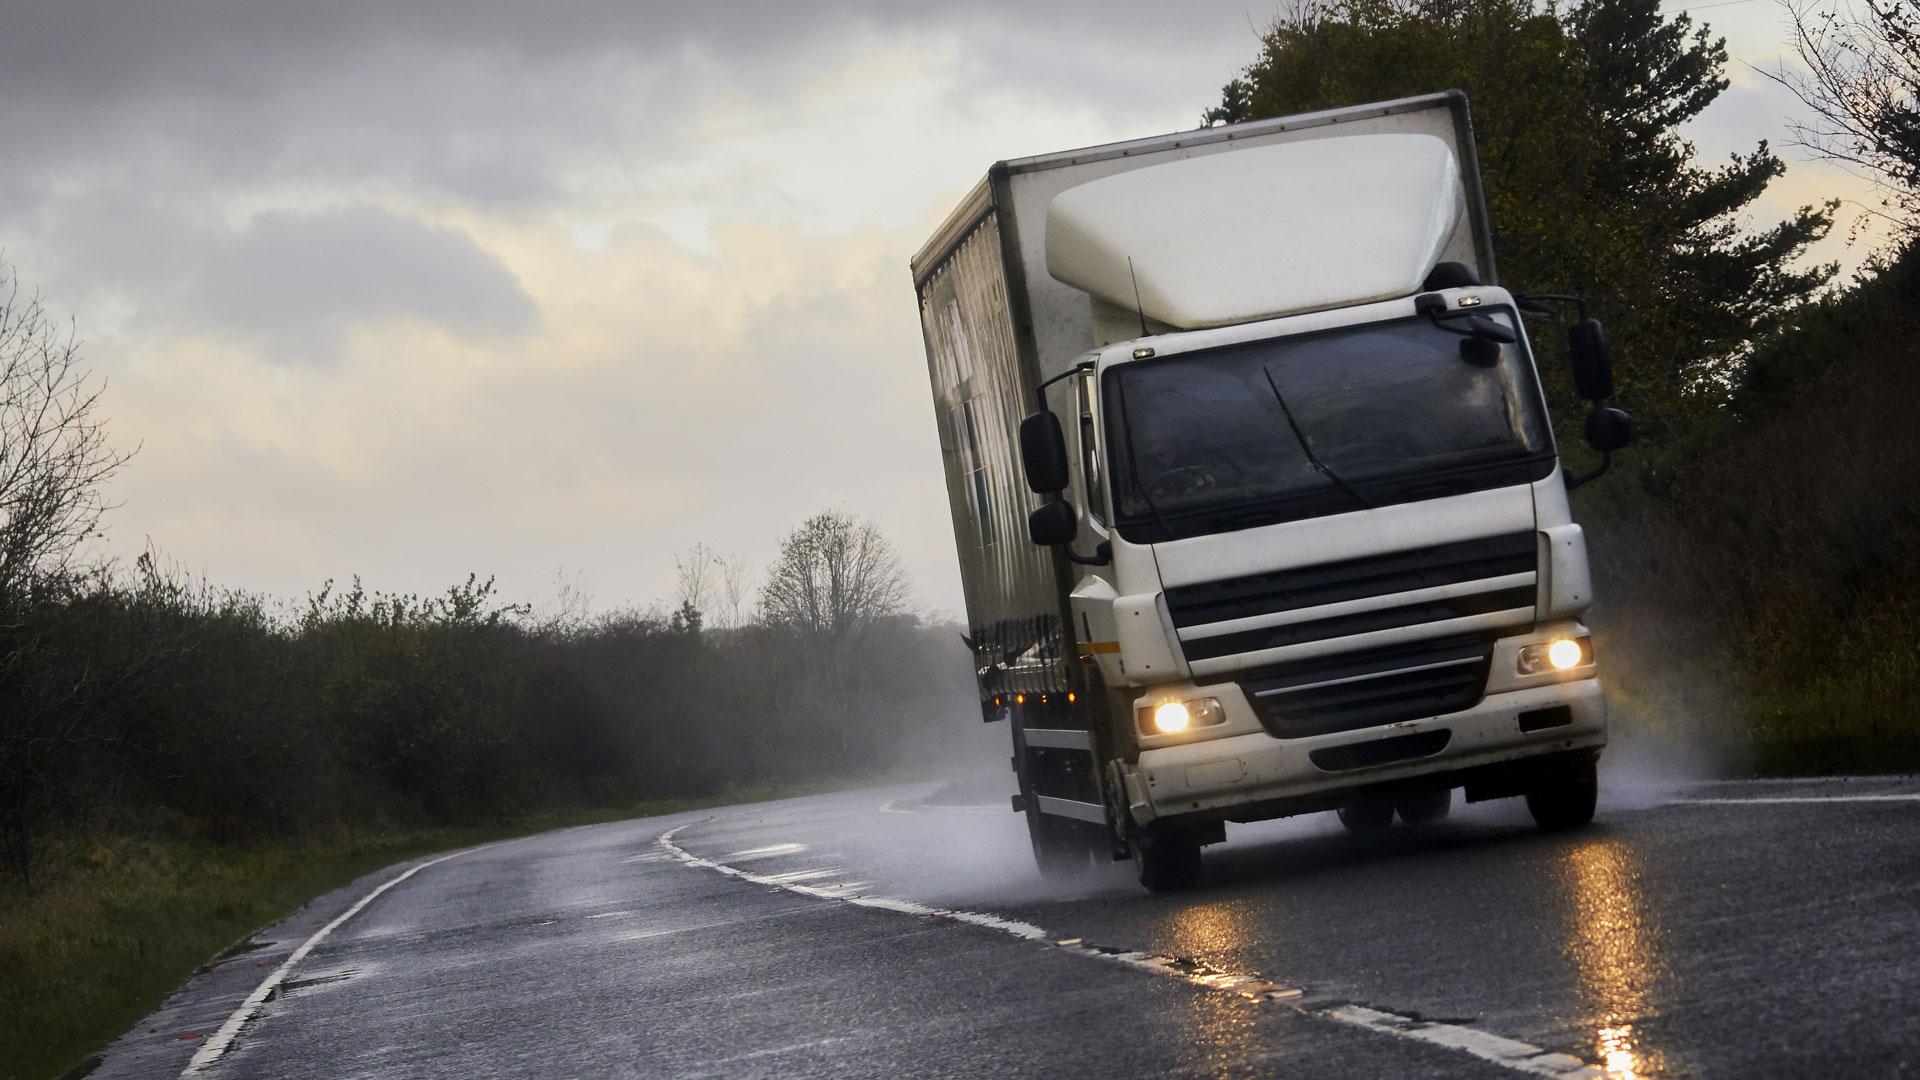 lorry on uk roads